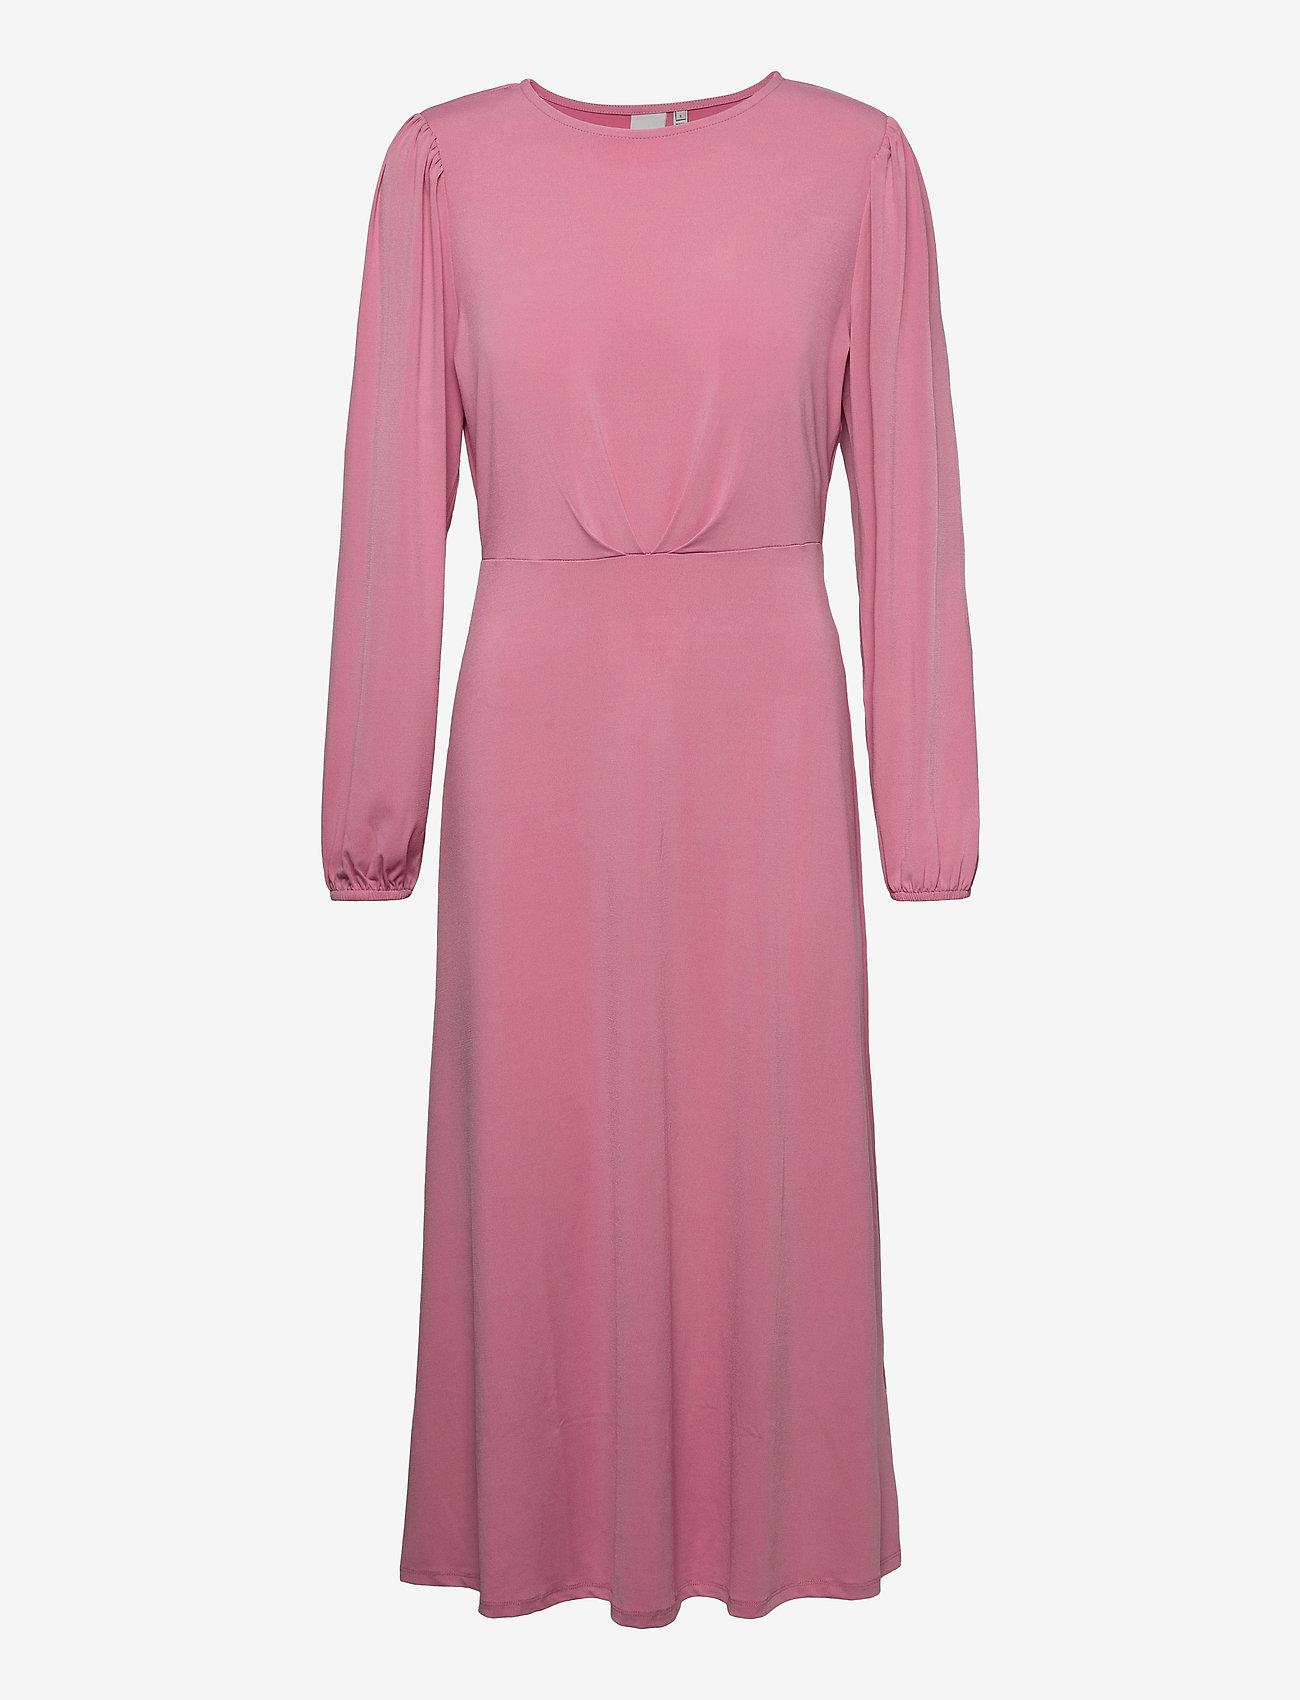 ICHI - IHKIRSTA DR - midi dresses - wild rose - 0